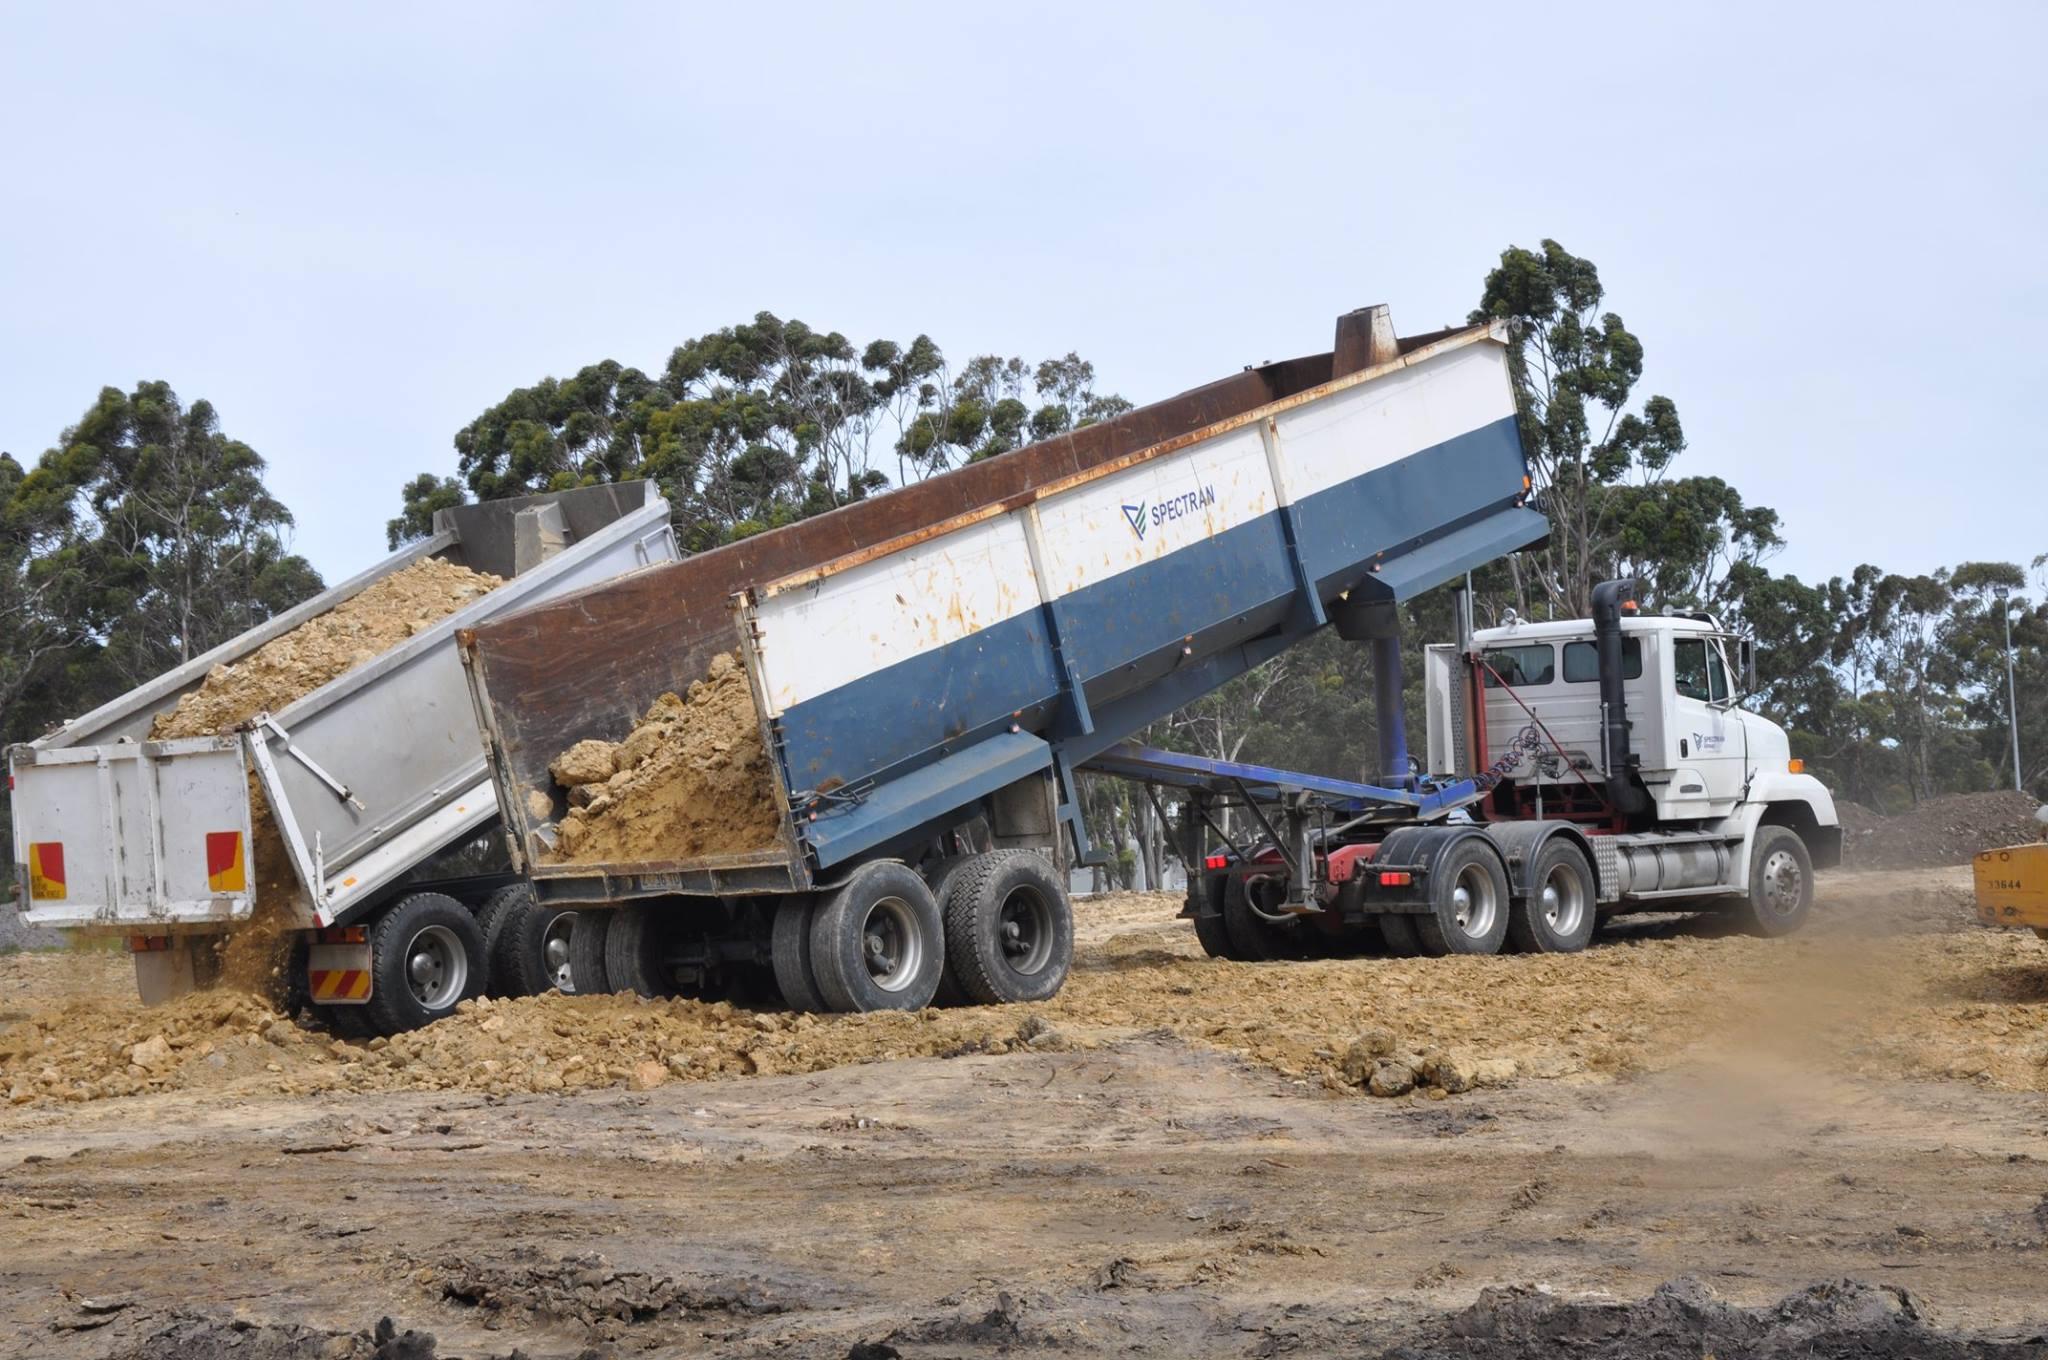 Spectran Group Tipper Truck with Dirt Hobart